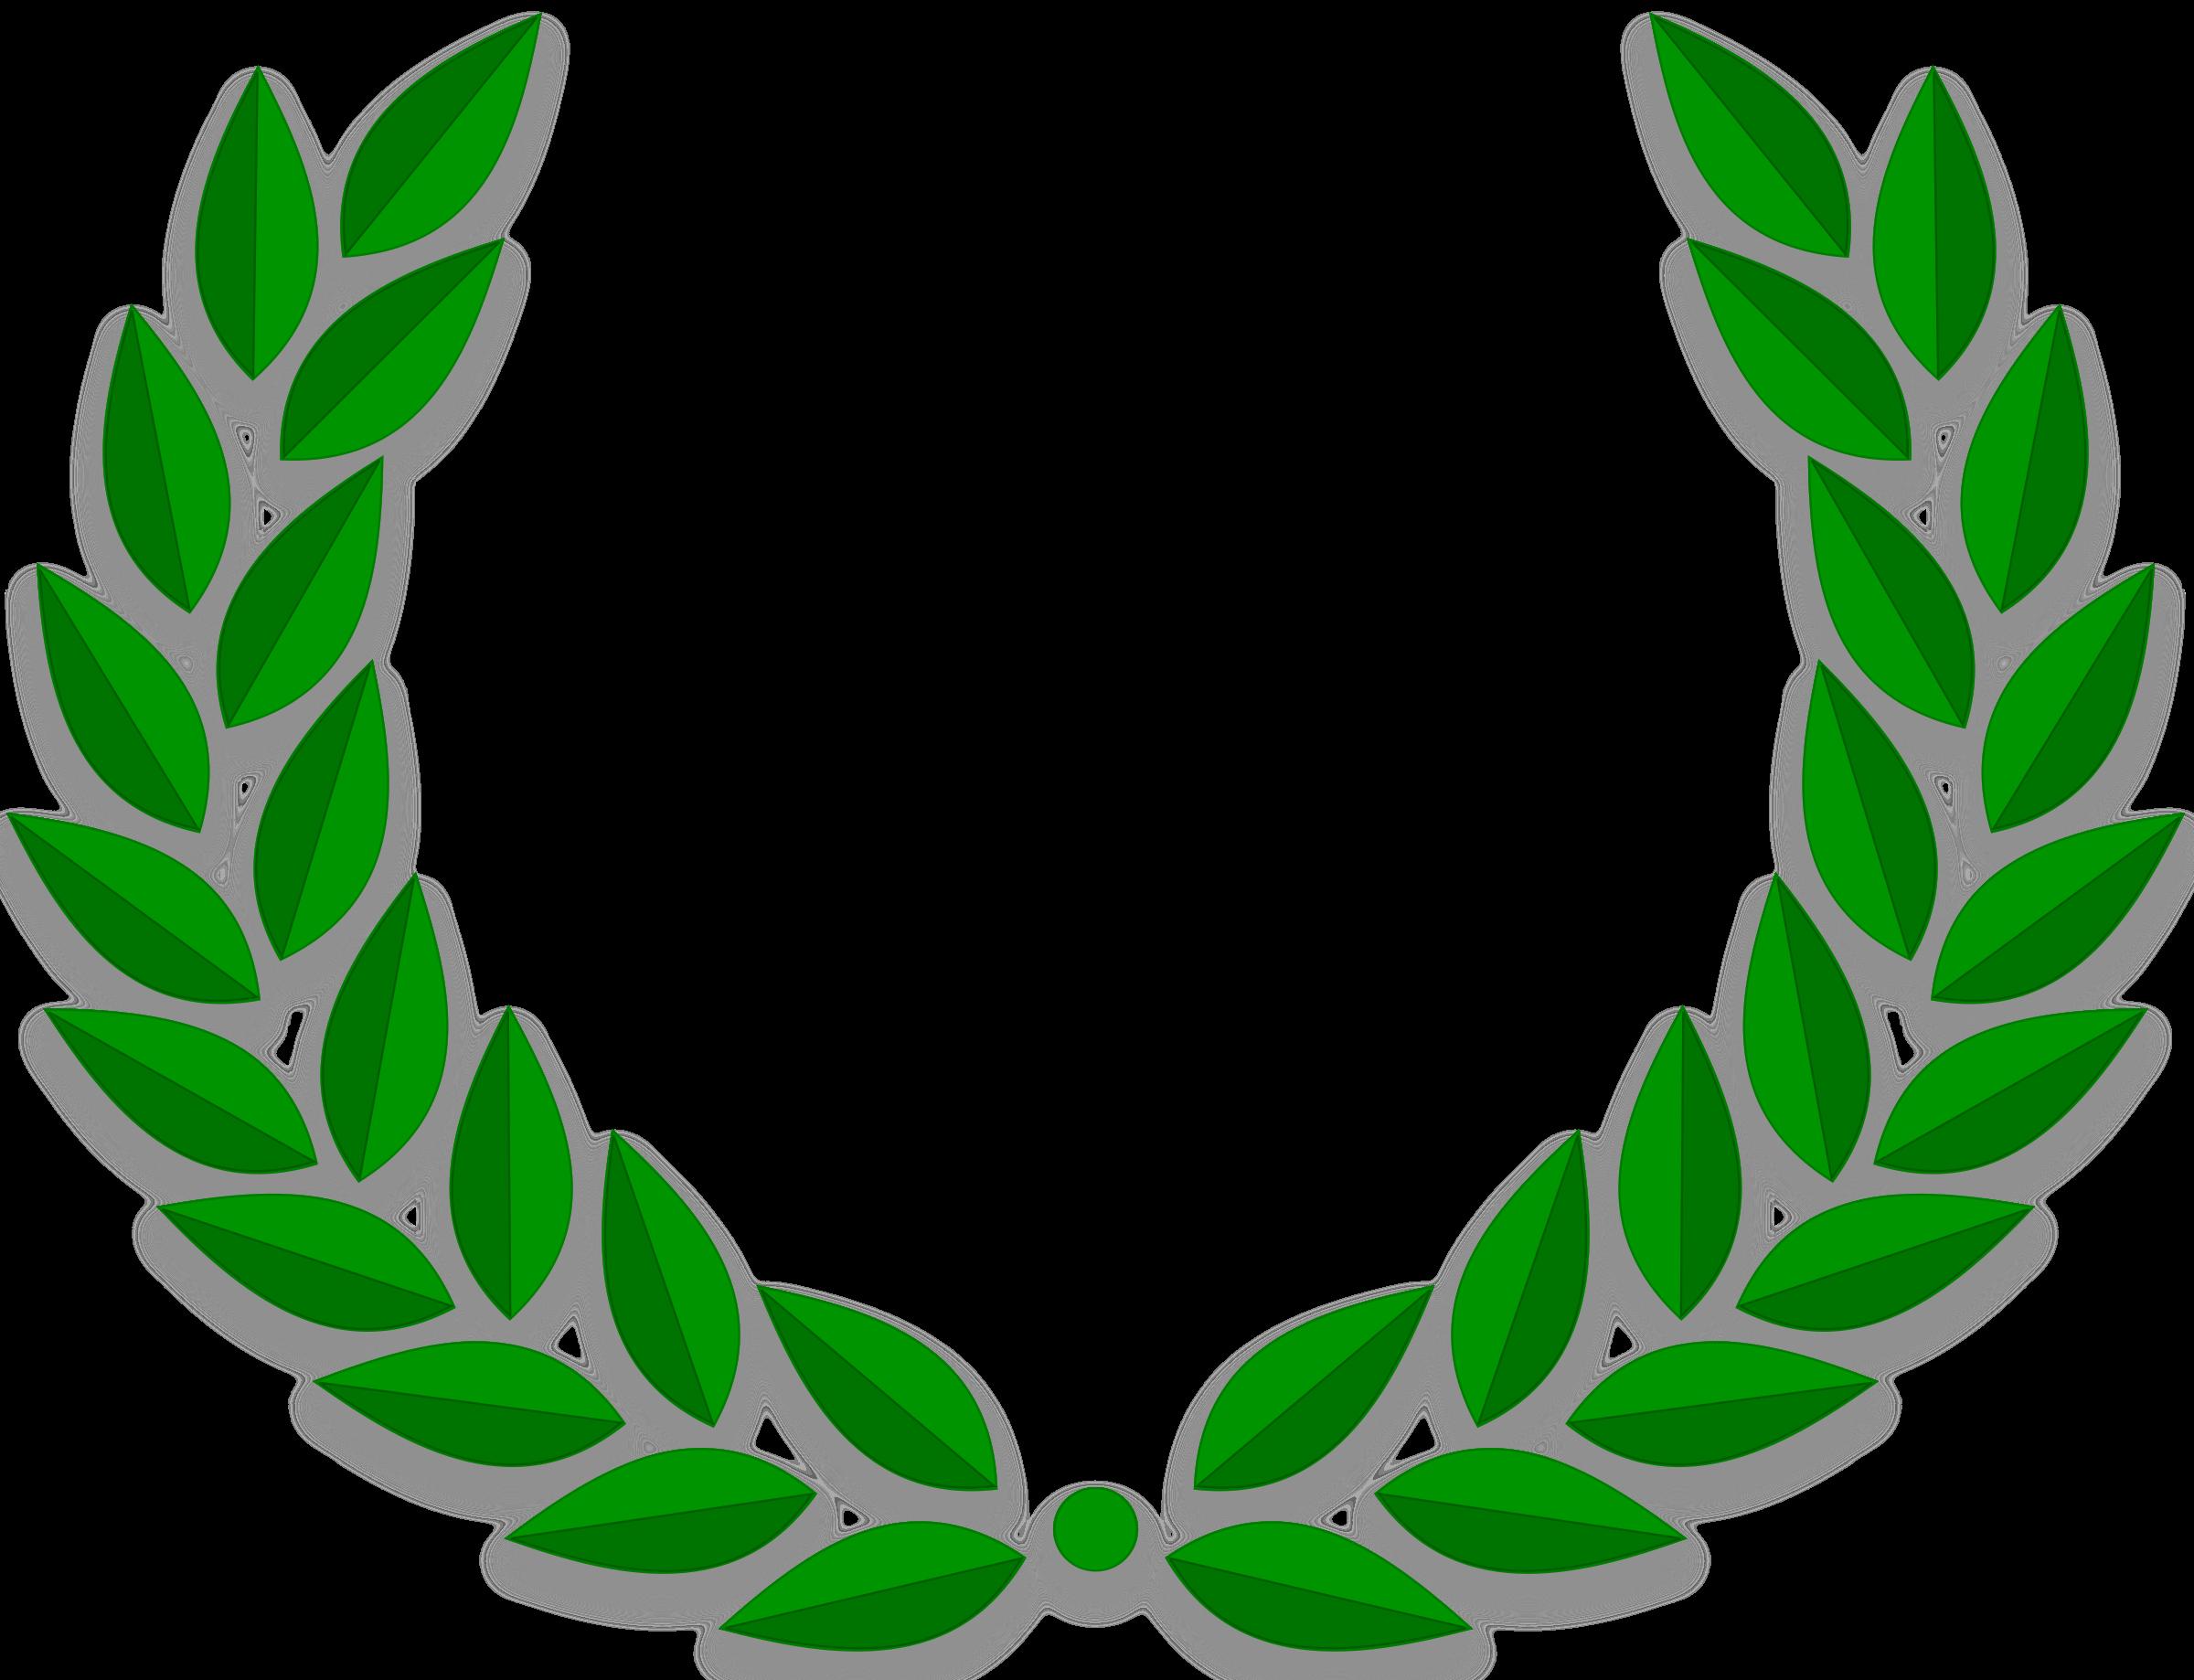 Laurel clipart olympic. Wreath big image png